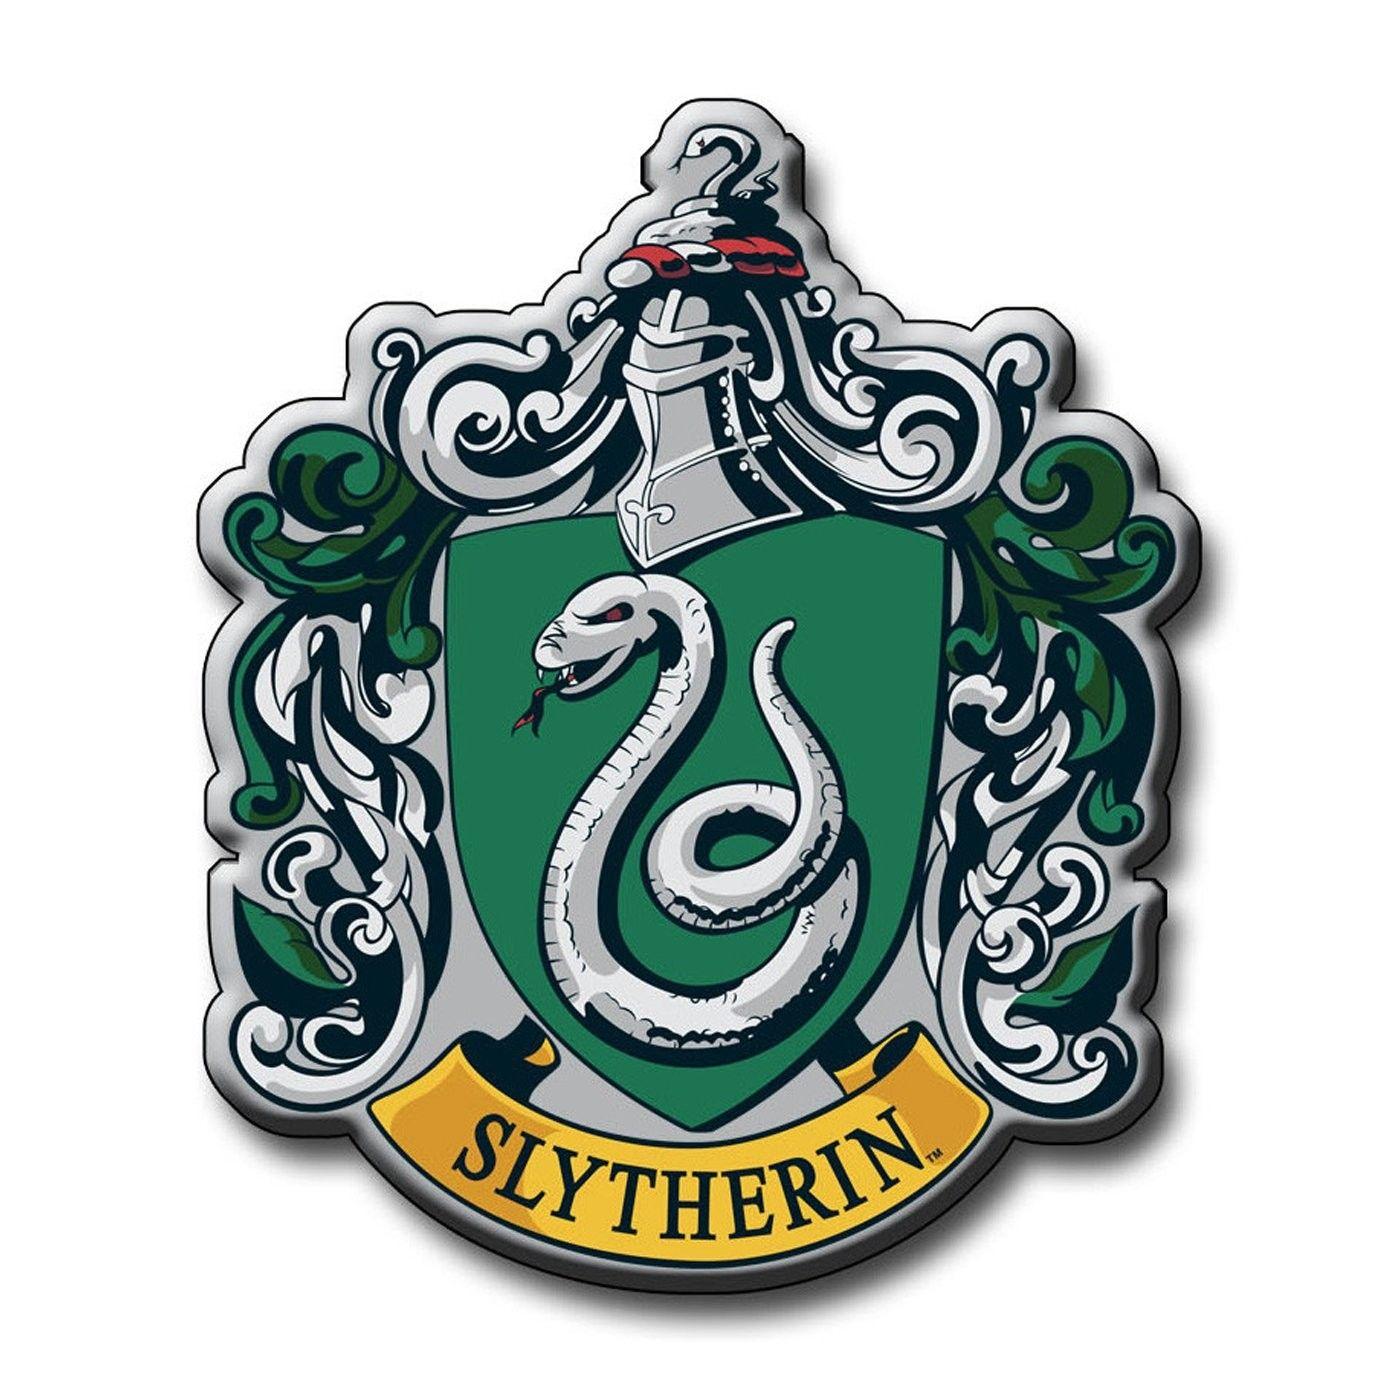 Inspirational Original Slytherin Crest Hogwarts Wappen Harry Potter Wappen Harry Potter Kostum